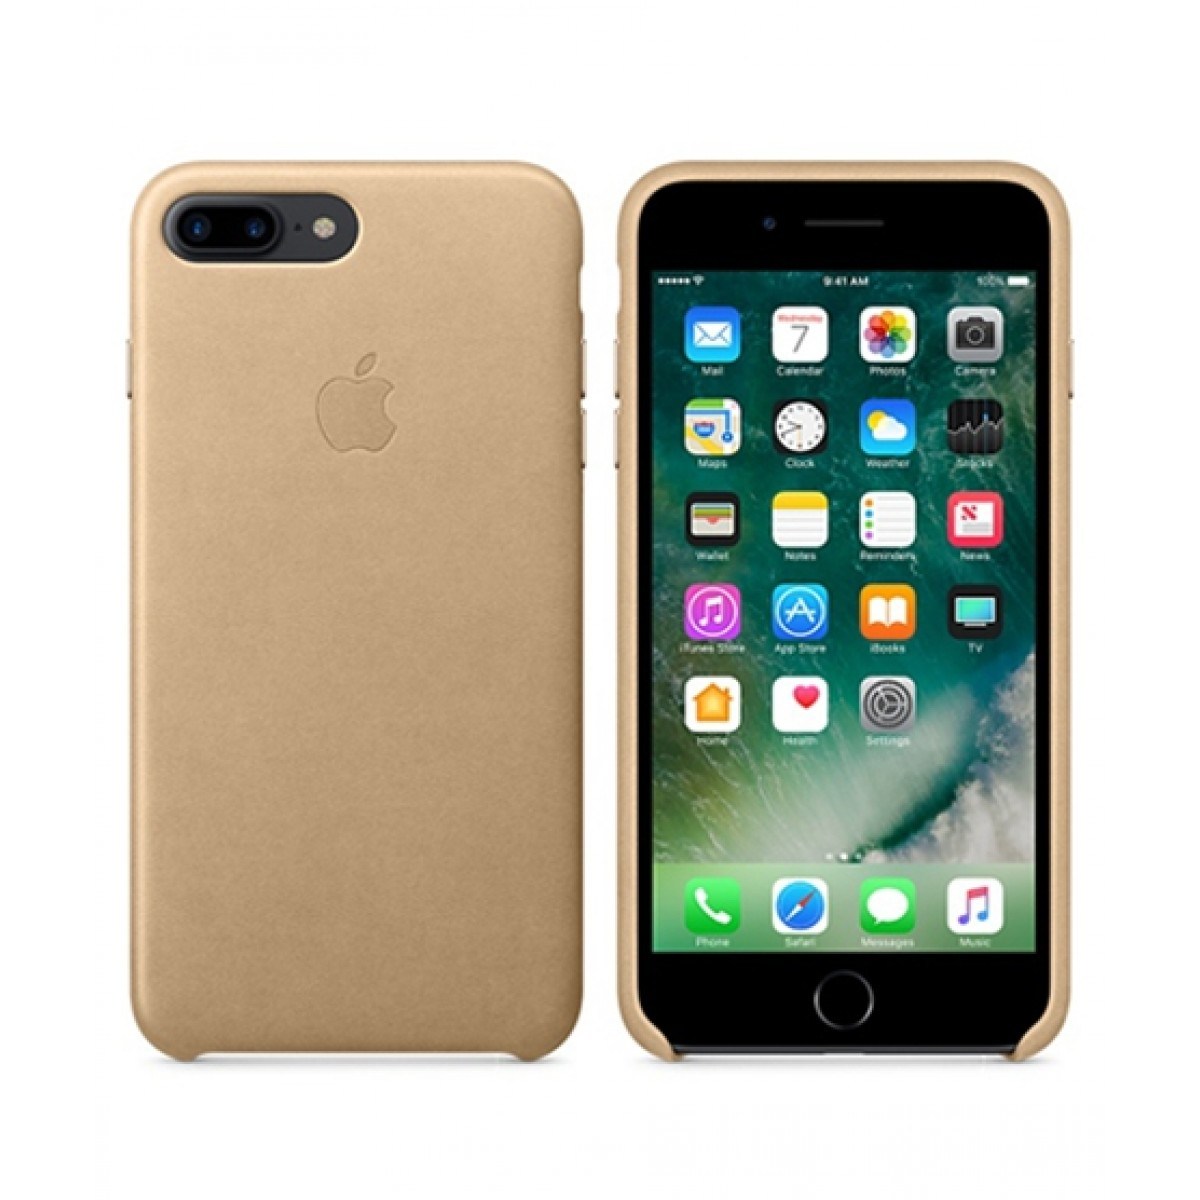 c42e68cb2fa Apple Leather Case For iPhone 7 Plus Price in Pakistan